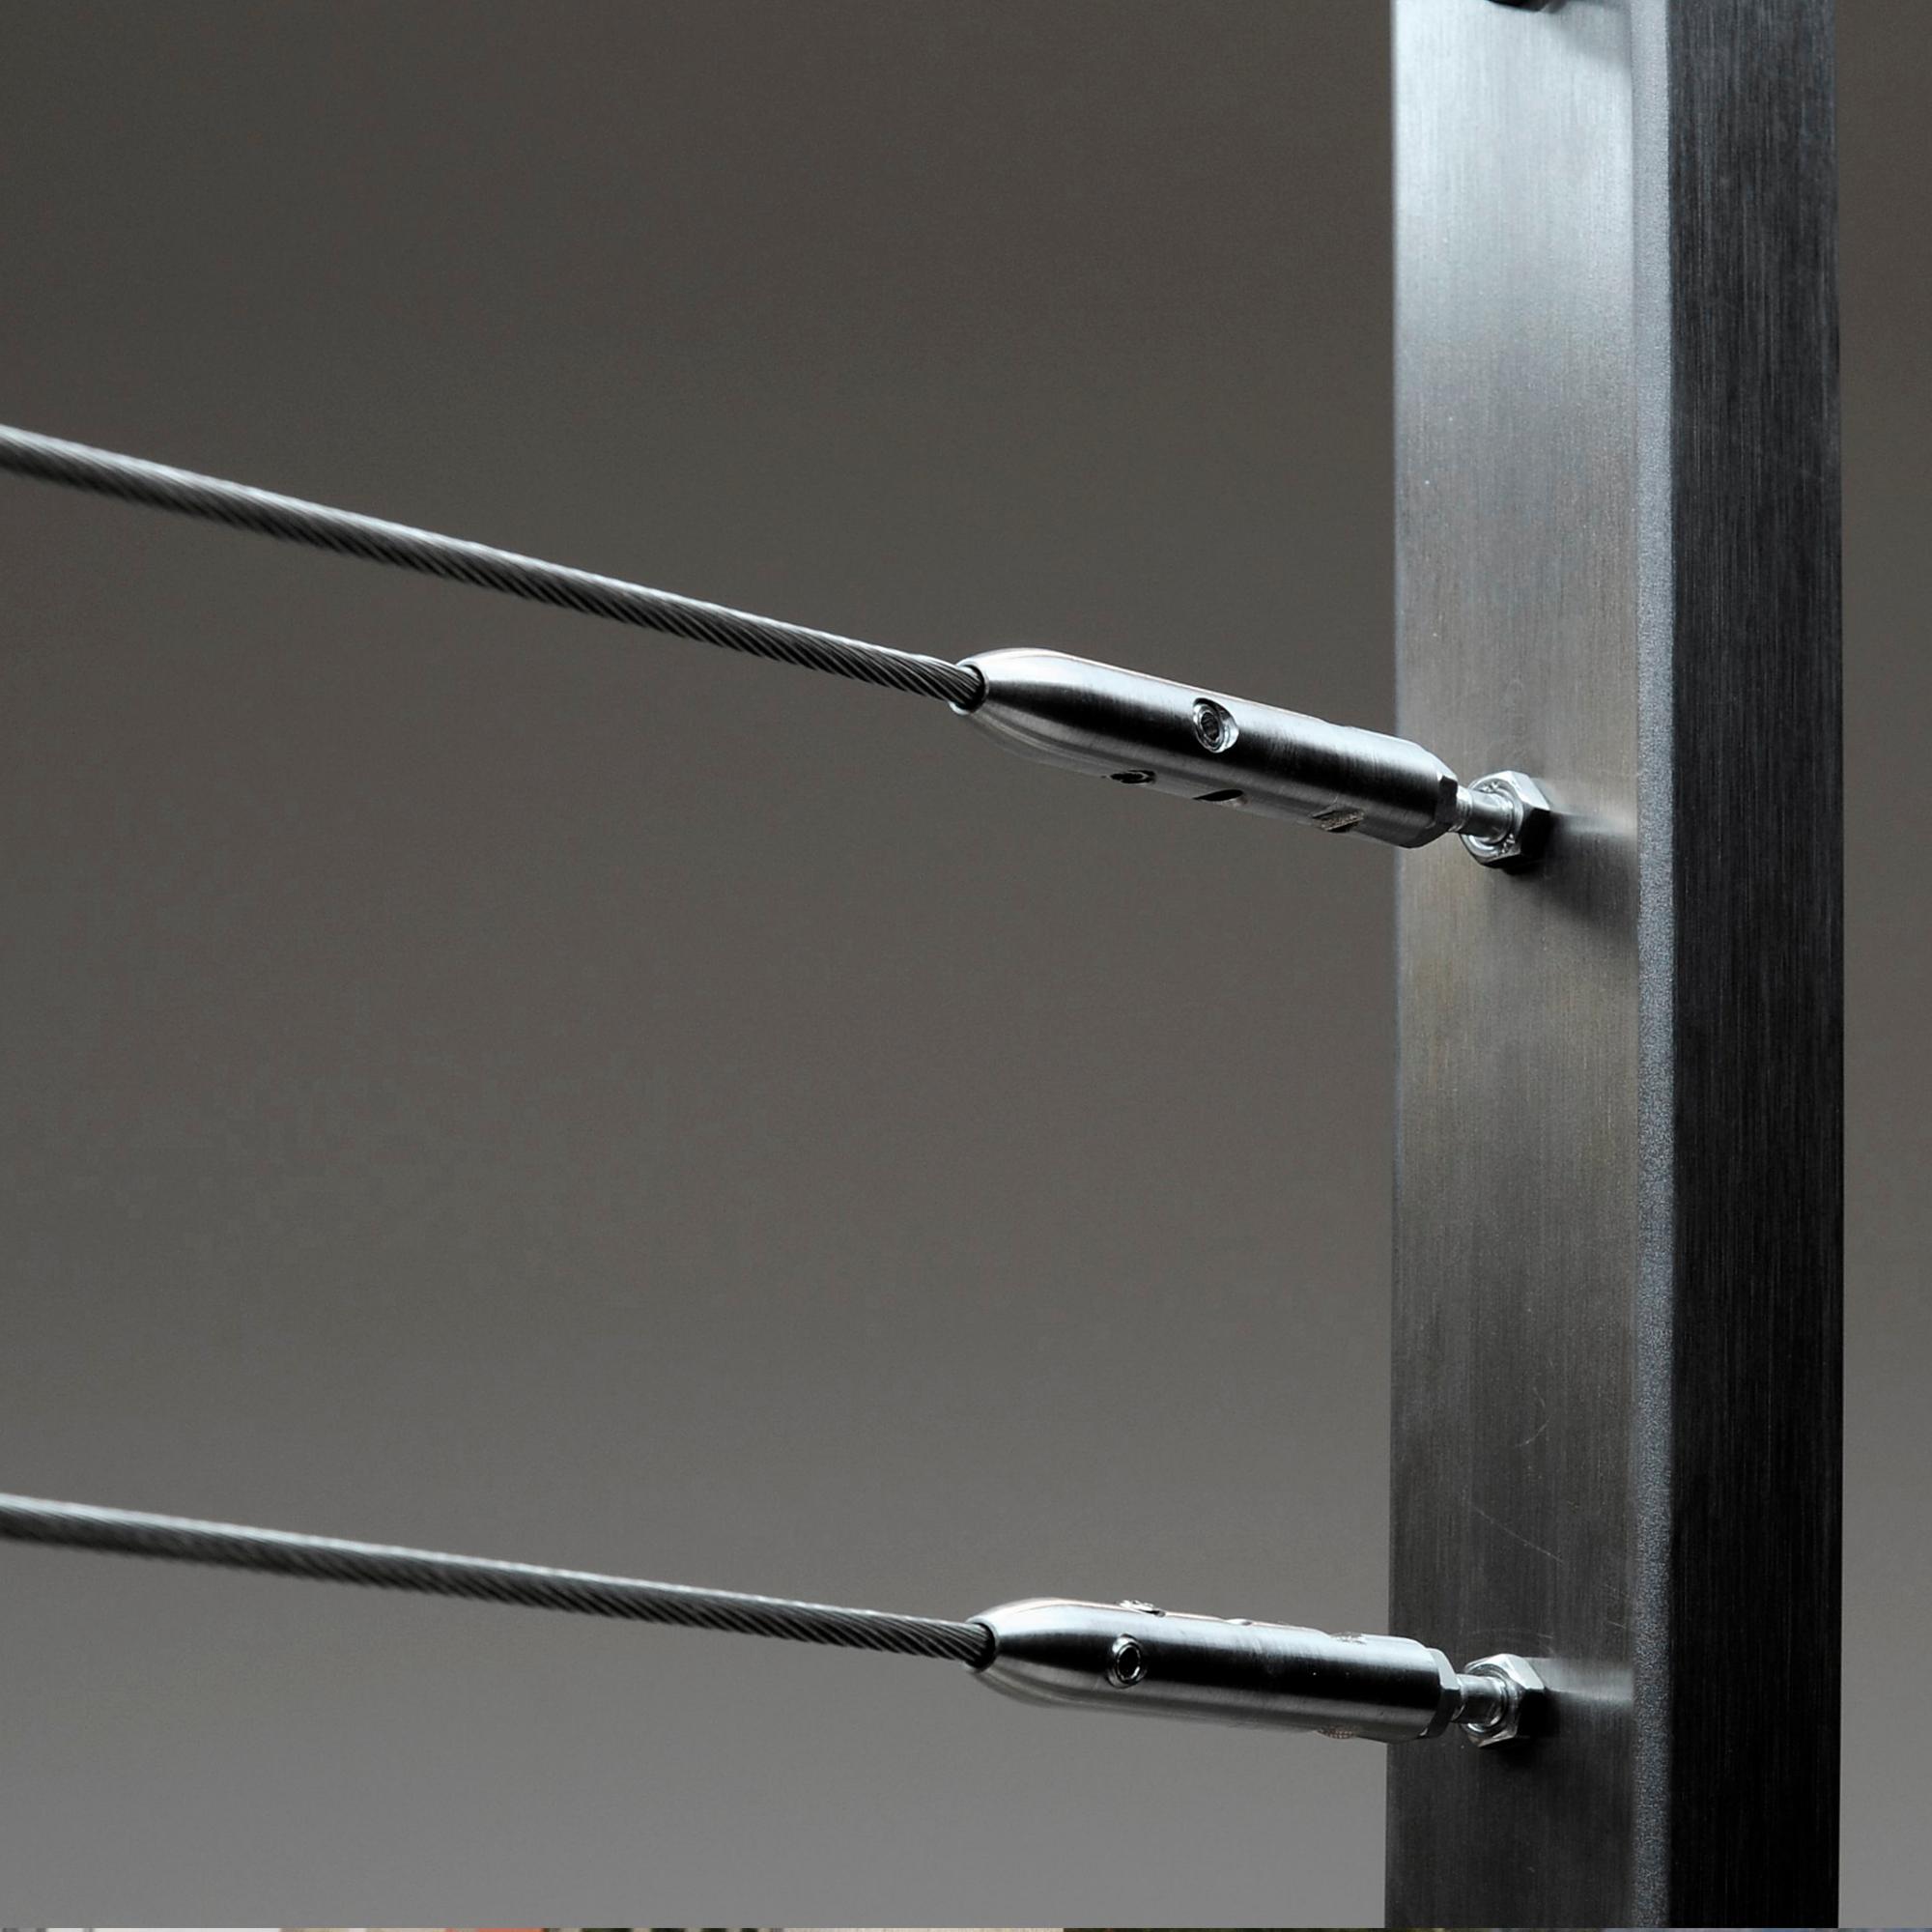 4mm Balustade fittings into Metal